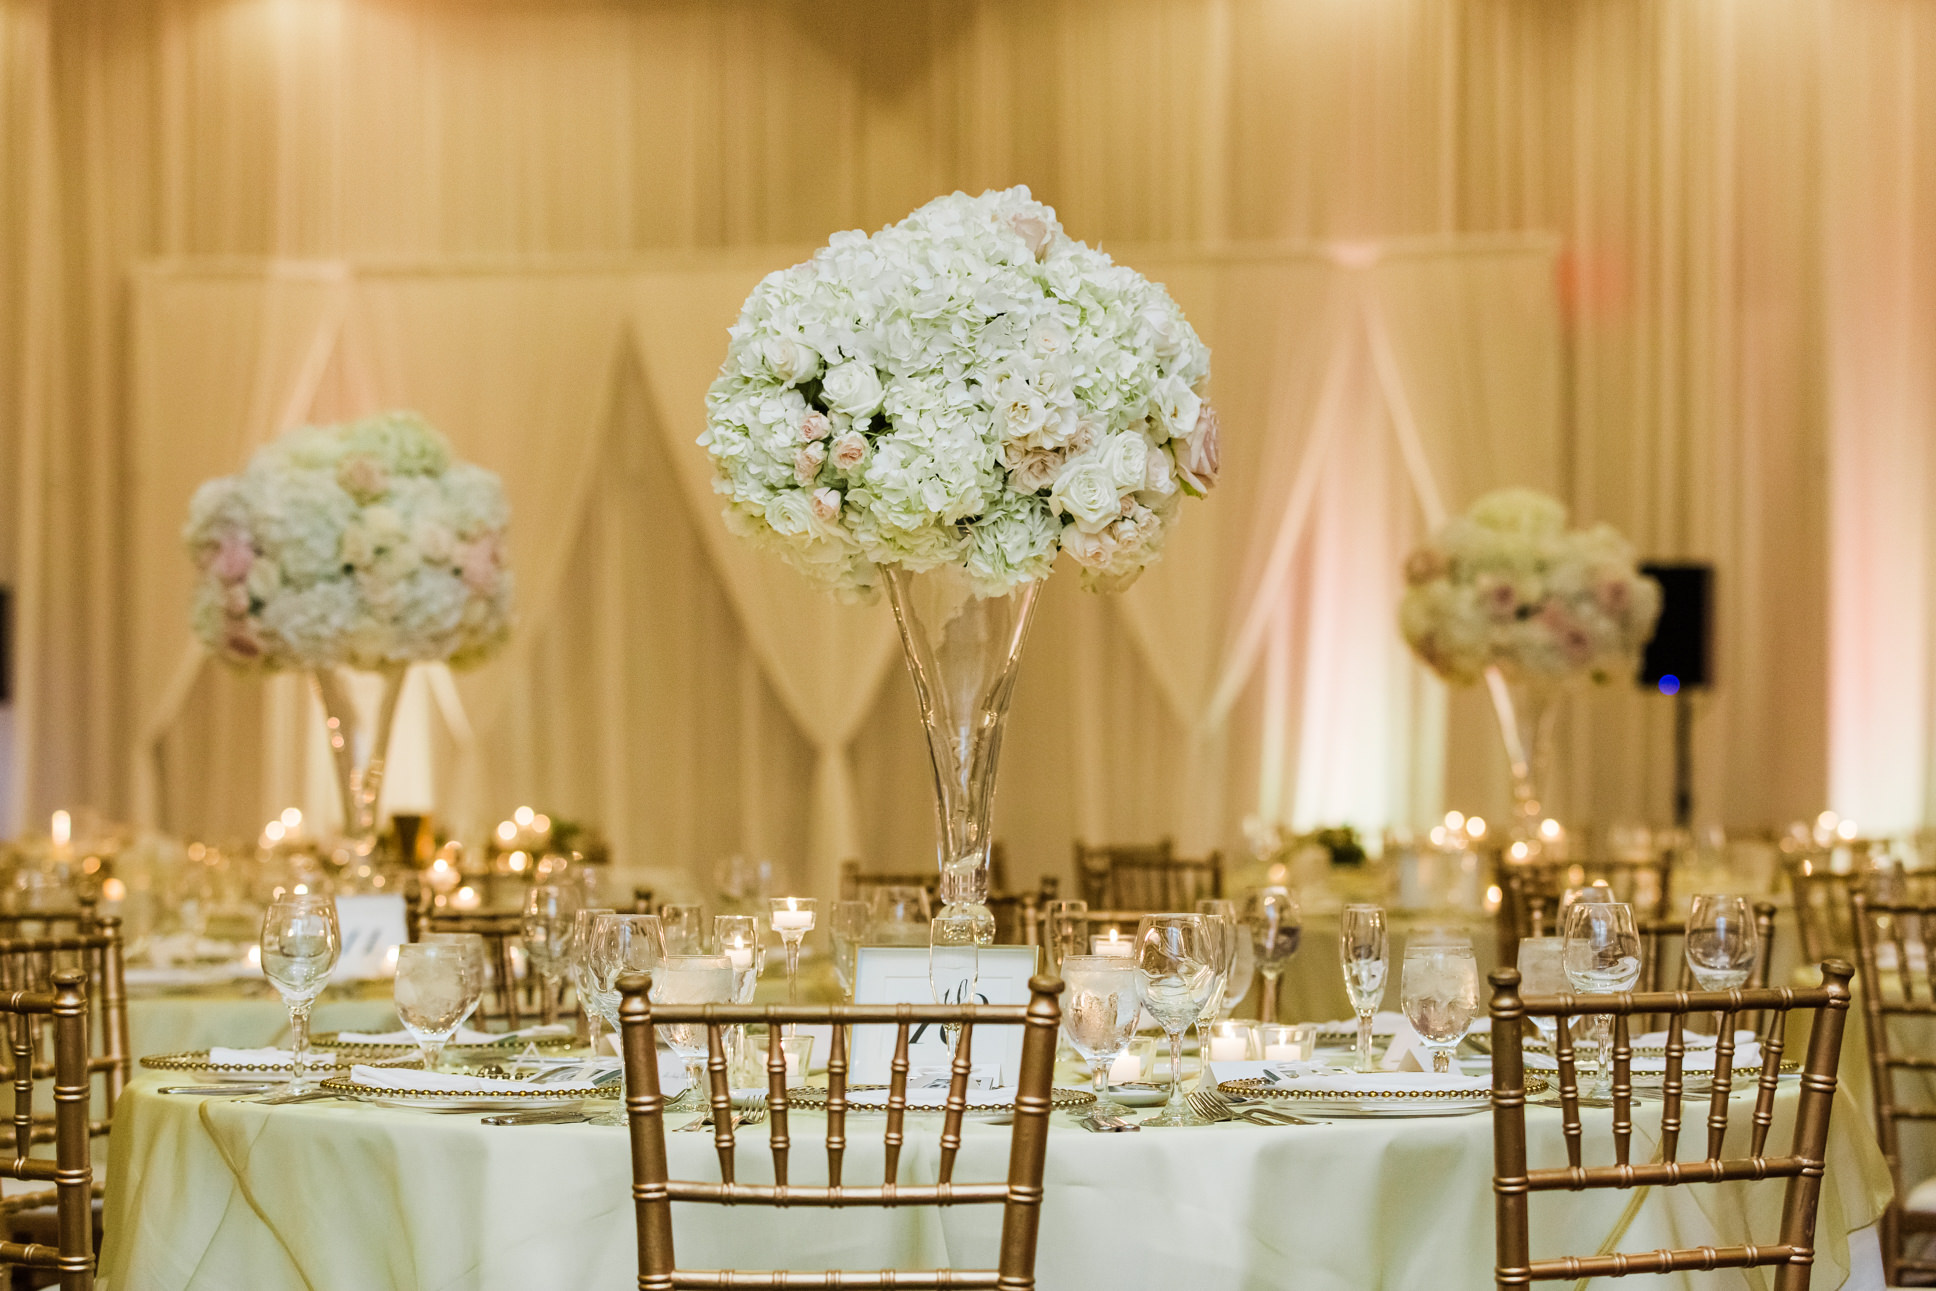 Elegant Ballroom Wedding Reception Decor, Gold Chiavari Chairs, White Hydrangeas and Blush Pink Roses Floral Arrangement on Glass Vase Centerpiece   Florida Tropical Hotel Wedding Venue The Vinoy Renaissance St. Petersburg Resort & Golf Club